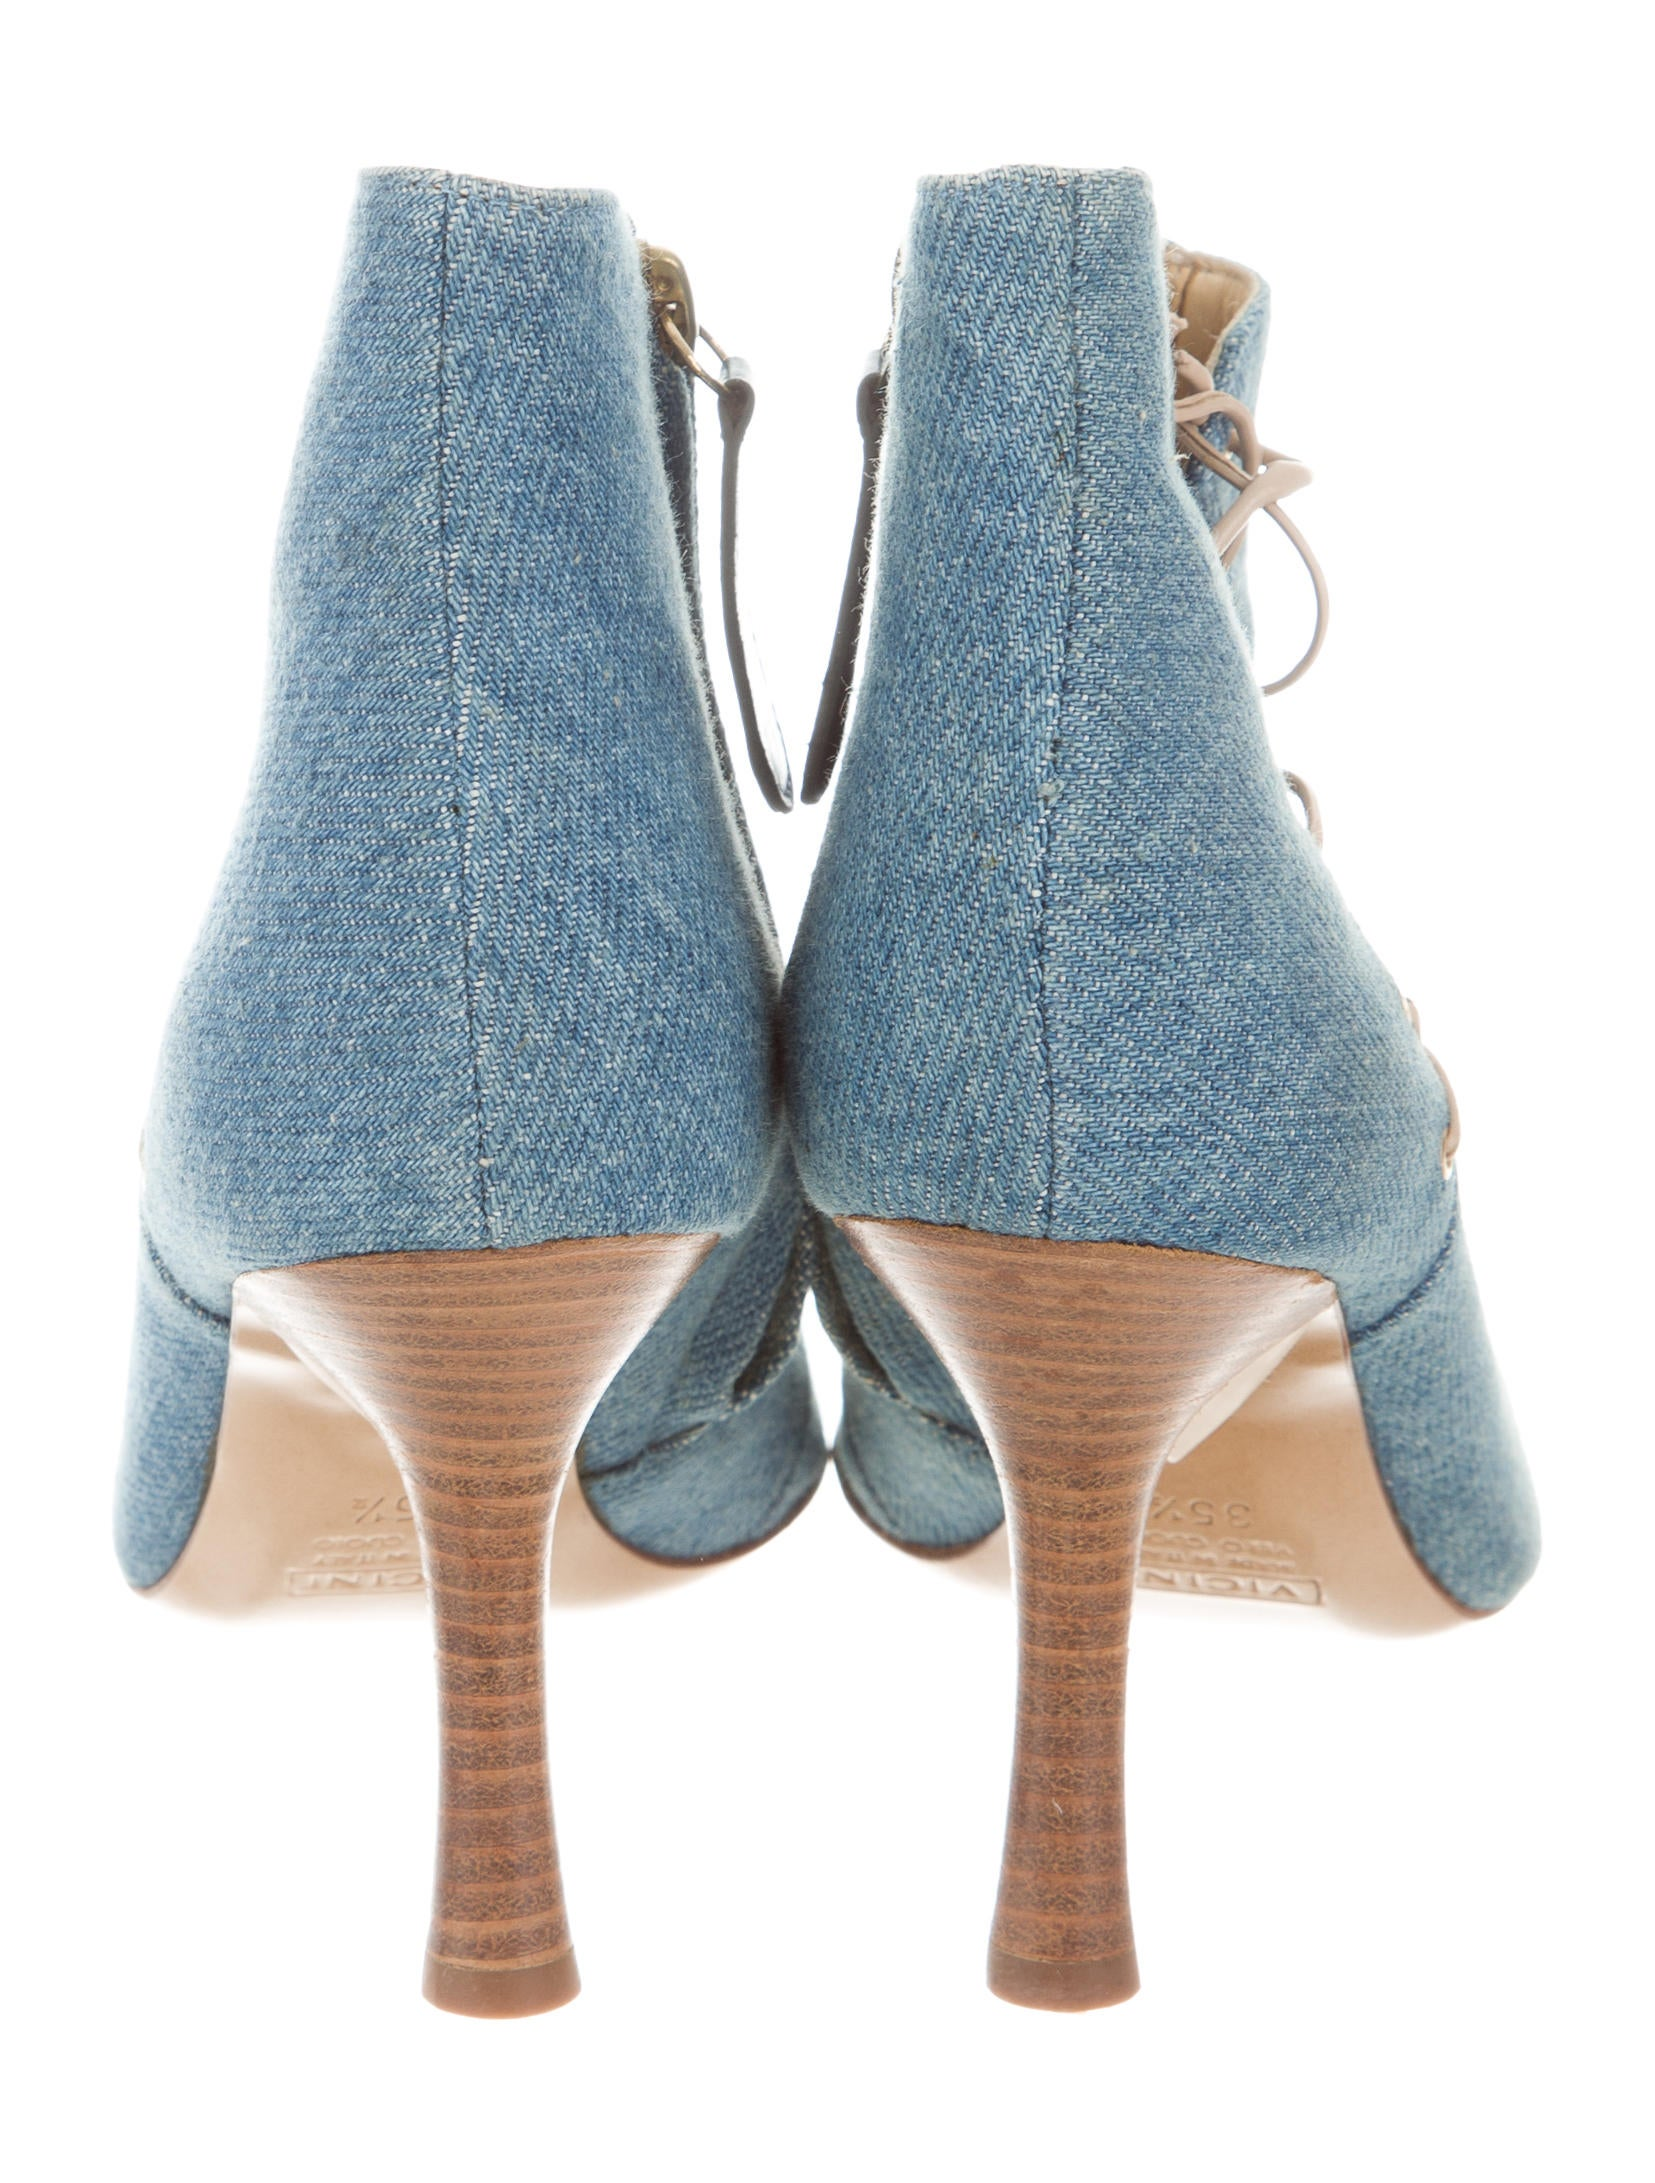 Giuseppe Zanotti Denim Ankle Boots Shoes Giu39266